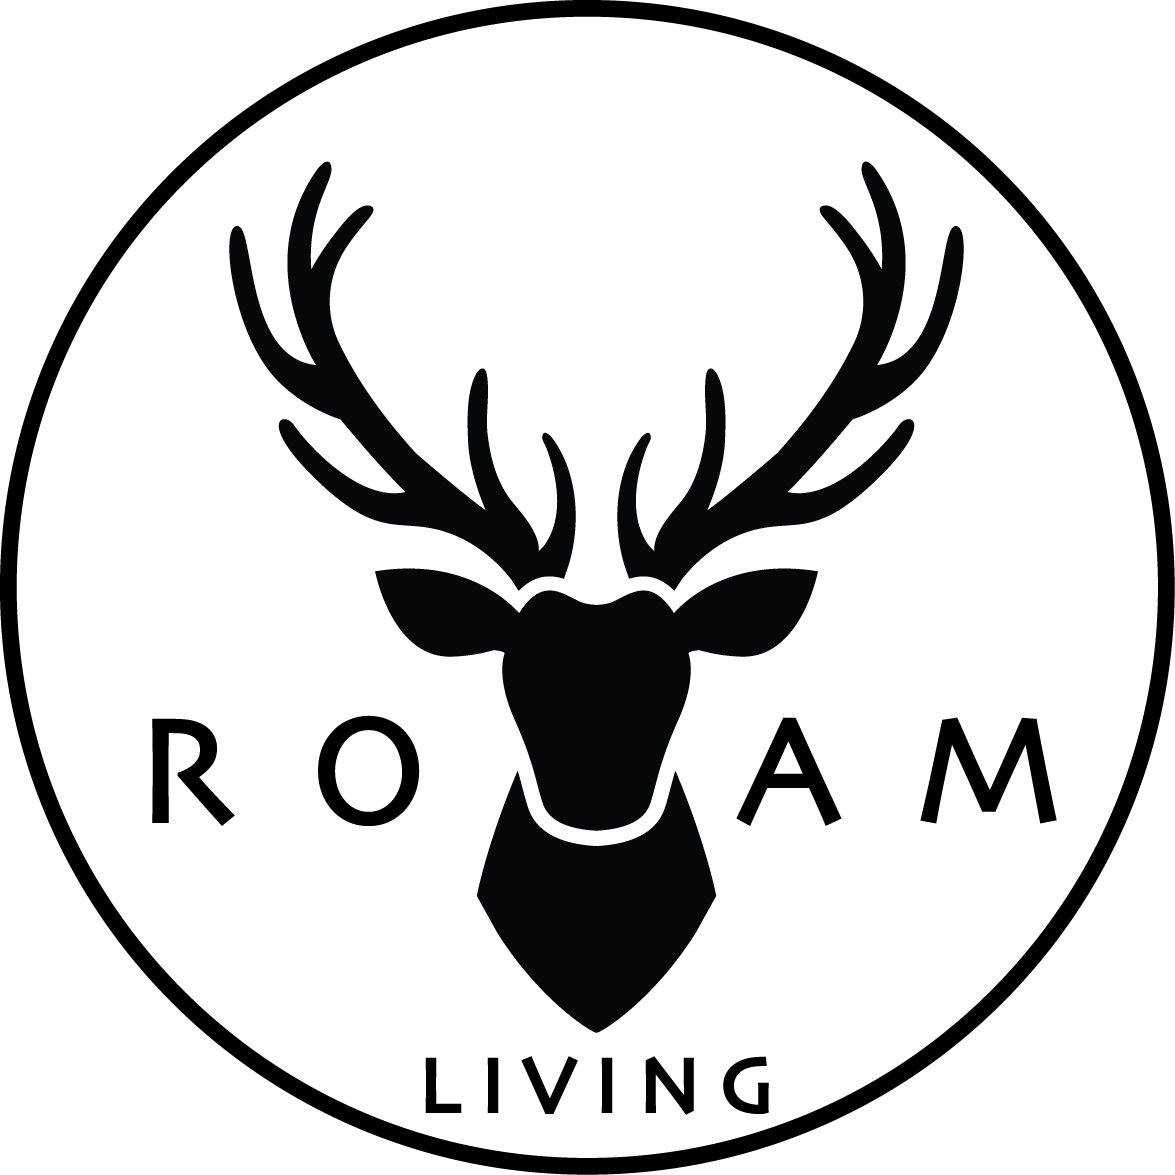 Roam_Living_Logo.png